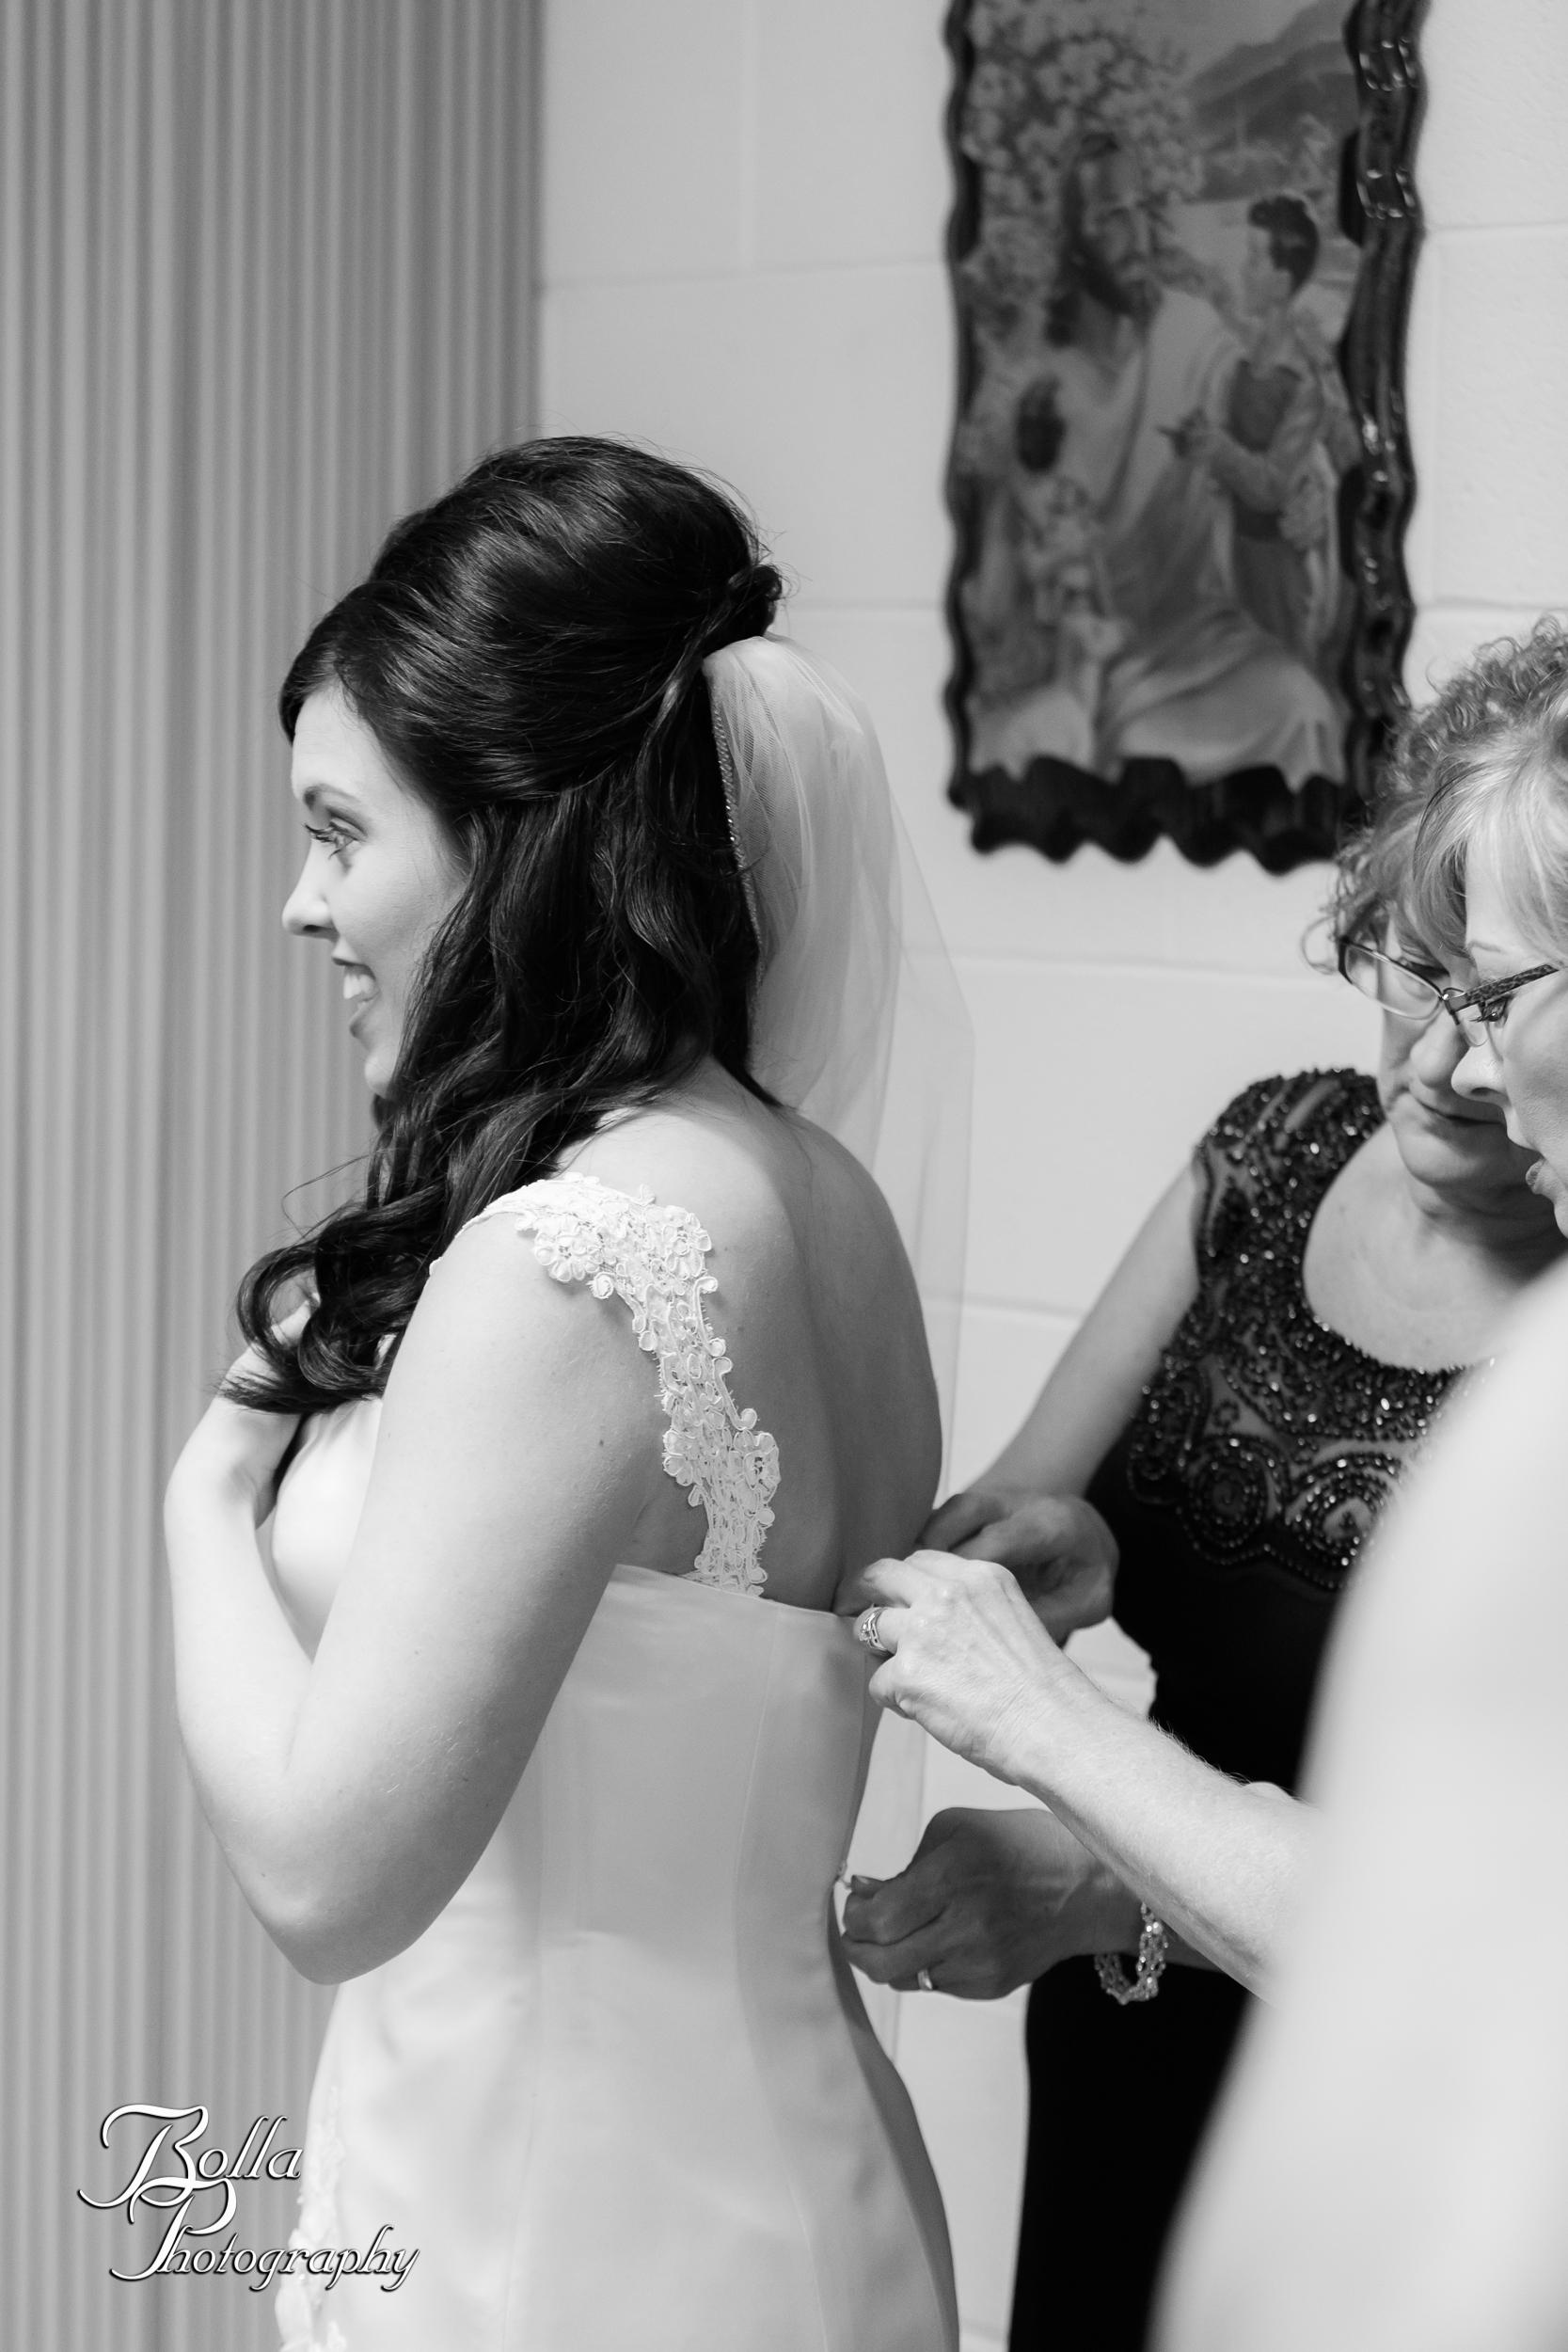 Bolla_photography_edwardsville_wedding_photographer_st_louis_weddings_Reilmann-0053.jpg